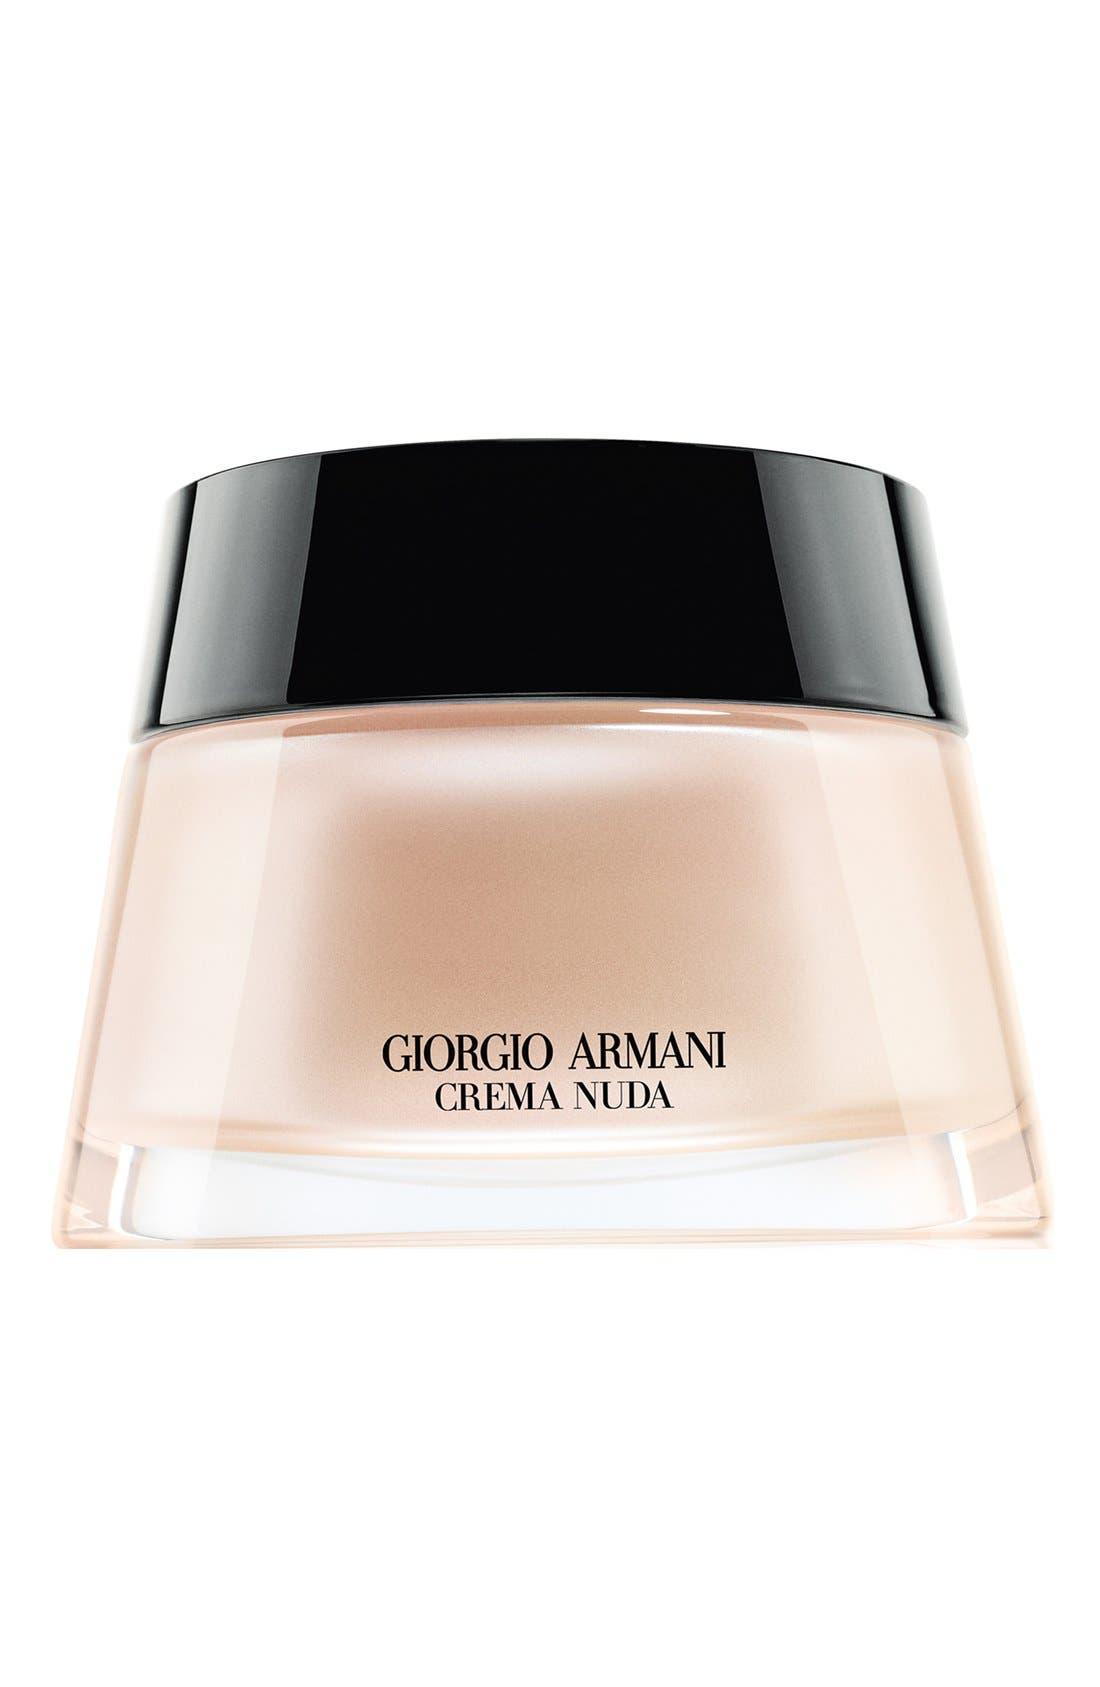 GIORGIO ARMANI Crema Nuda Tinted Cream, Main, color, 01 NUDE GLOW